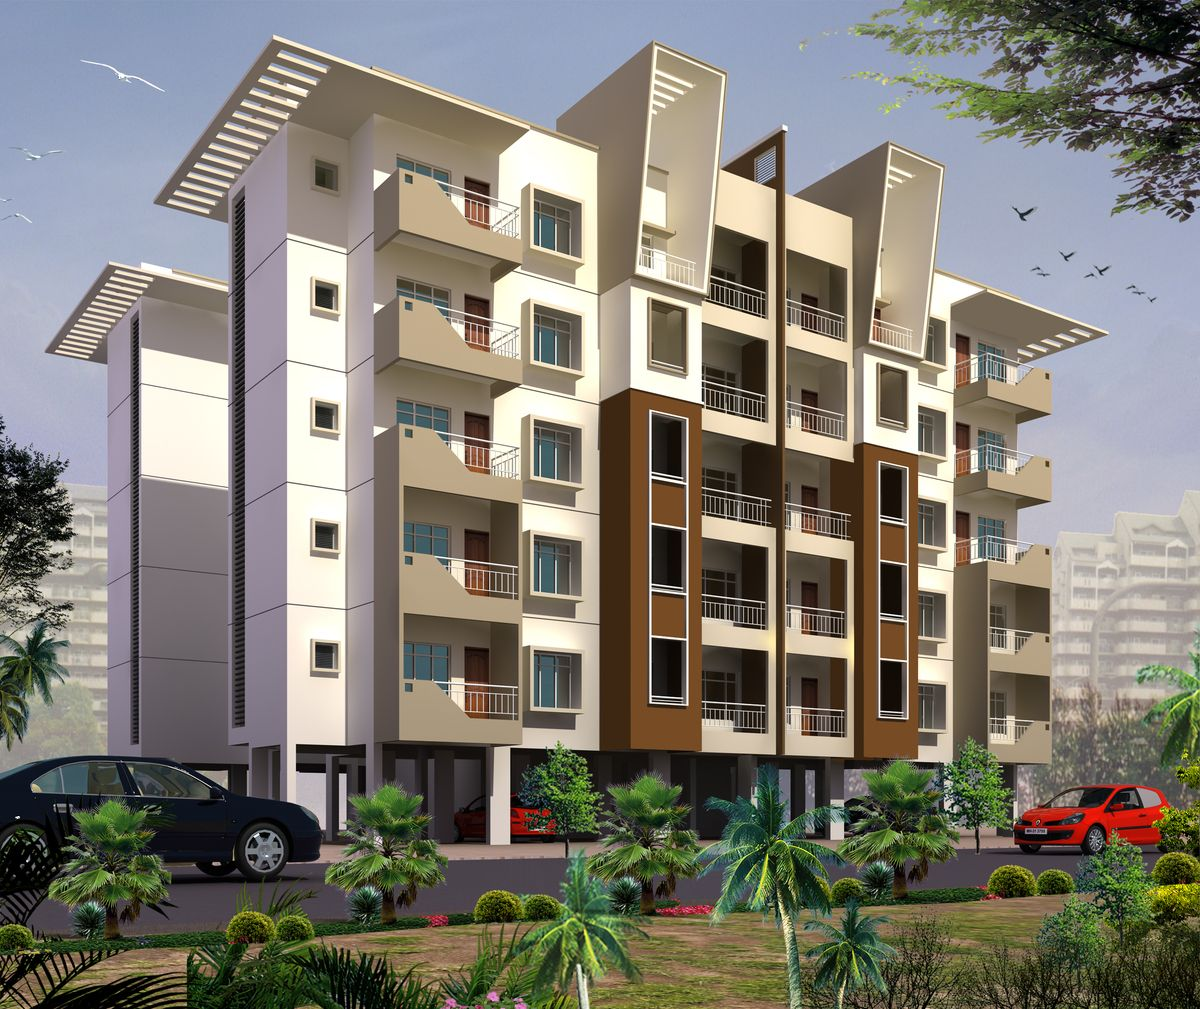 Tata Value Homes Sector 37 Bahadurgarh